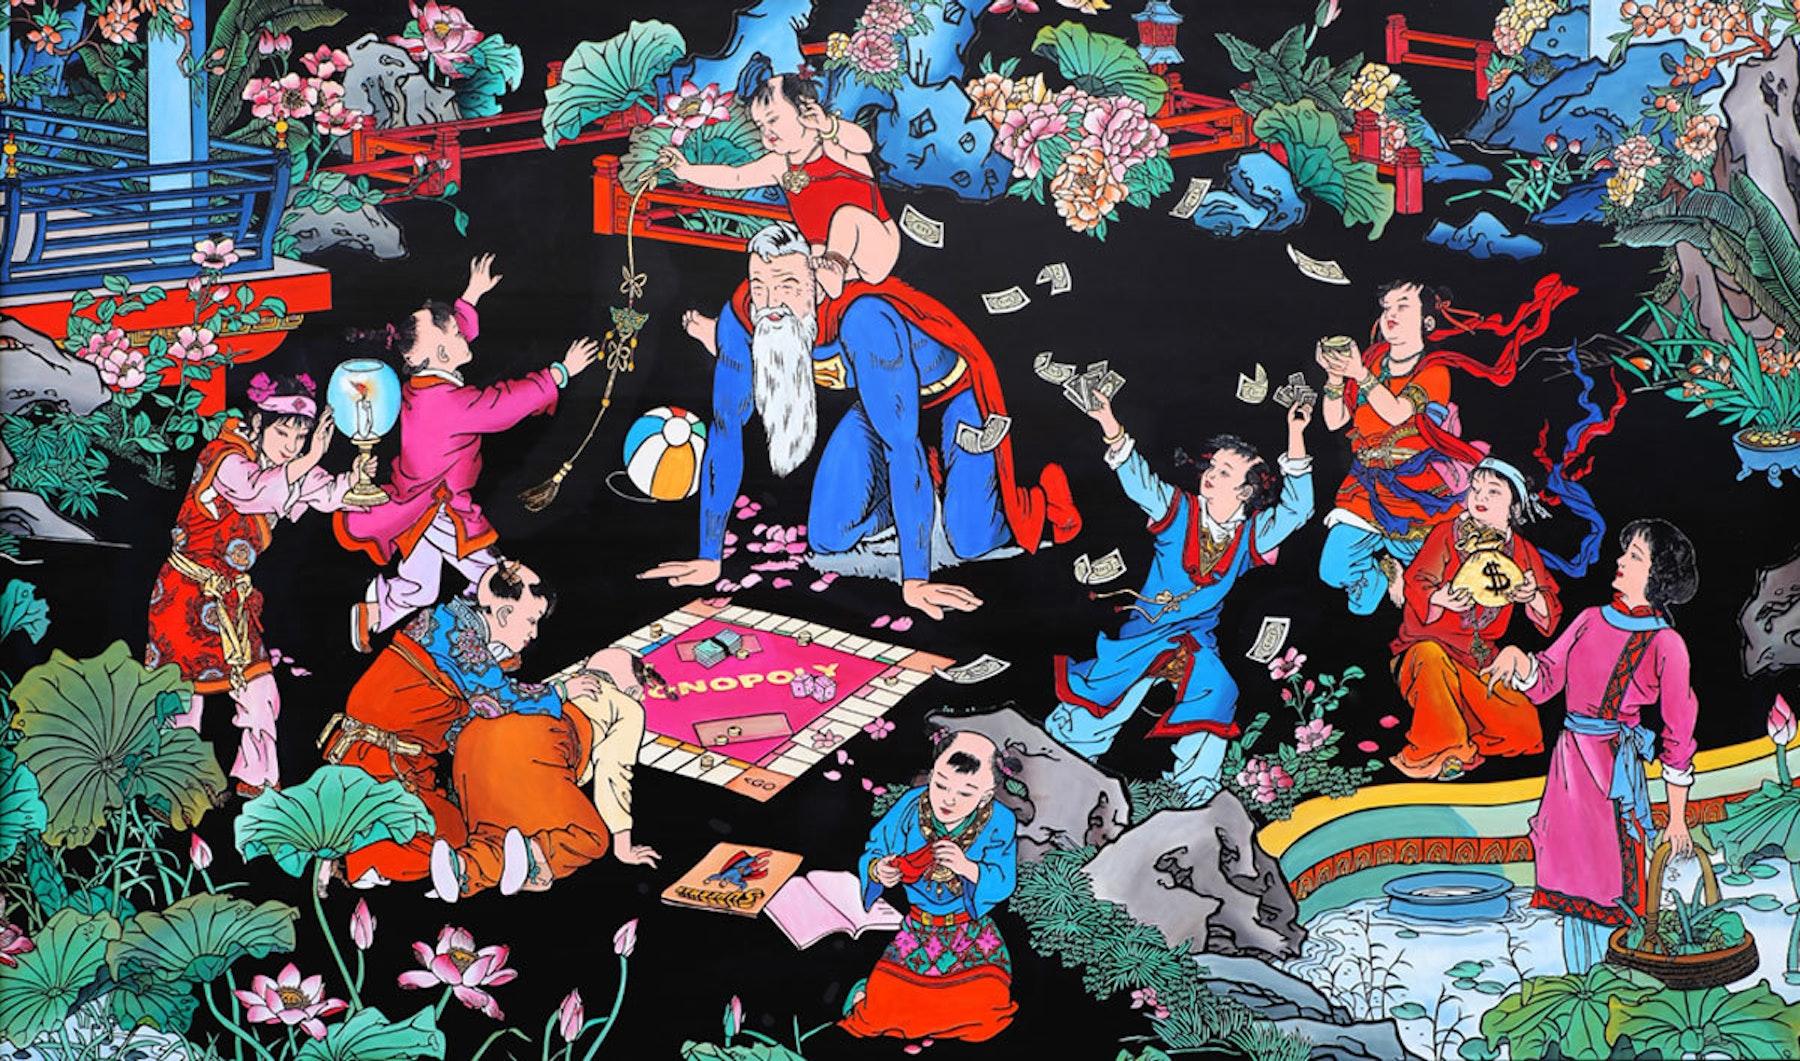 'The Retirement' by Jacky Tsai